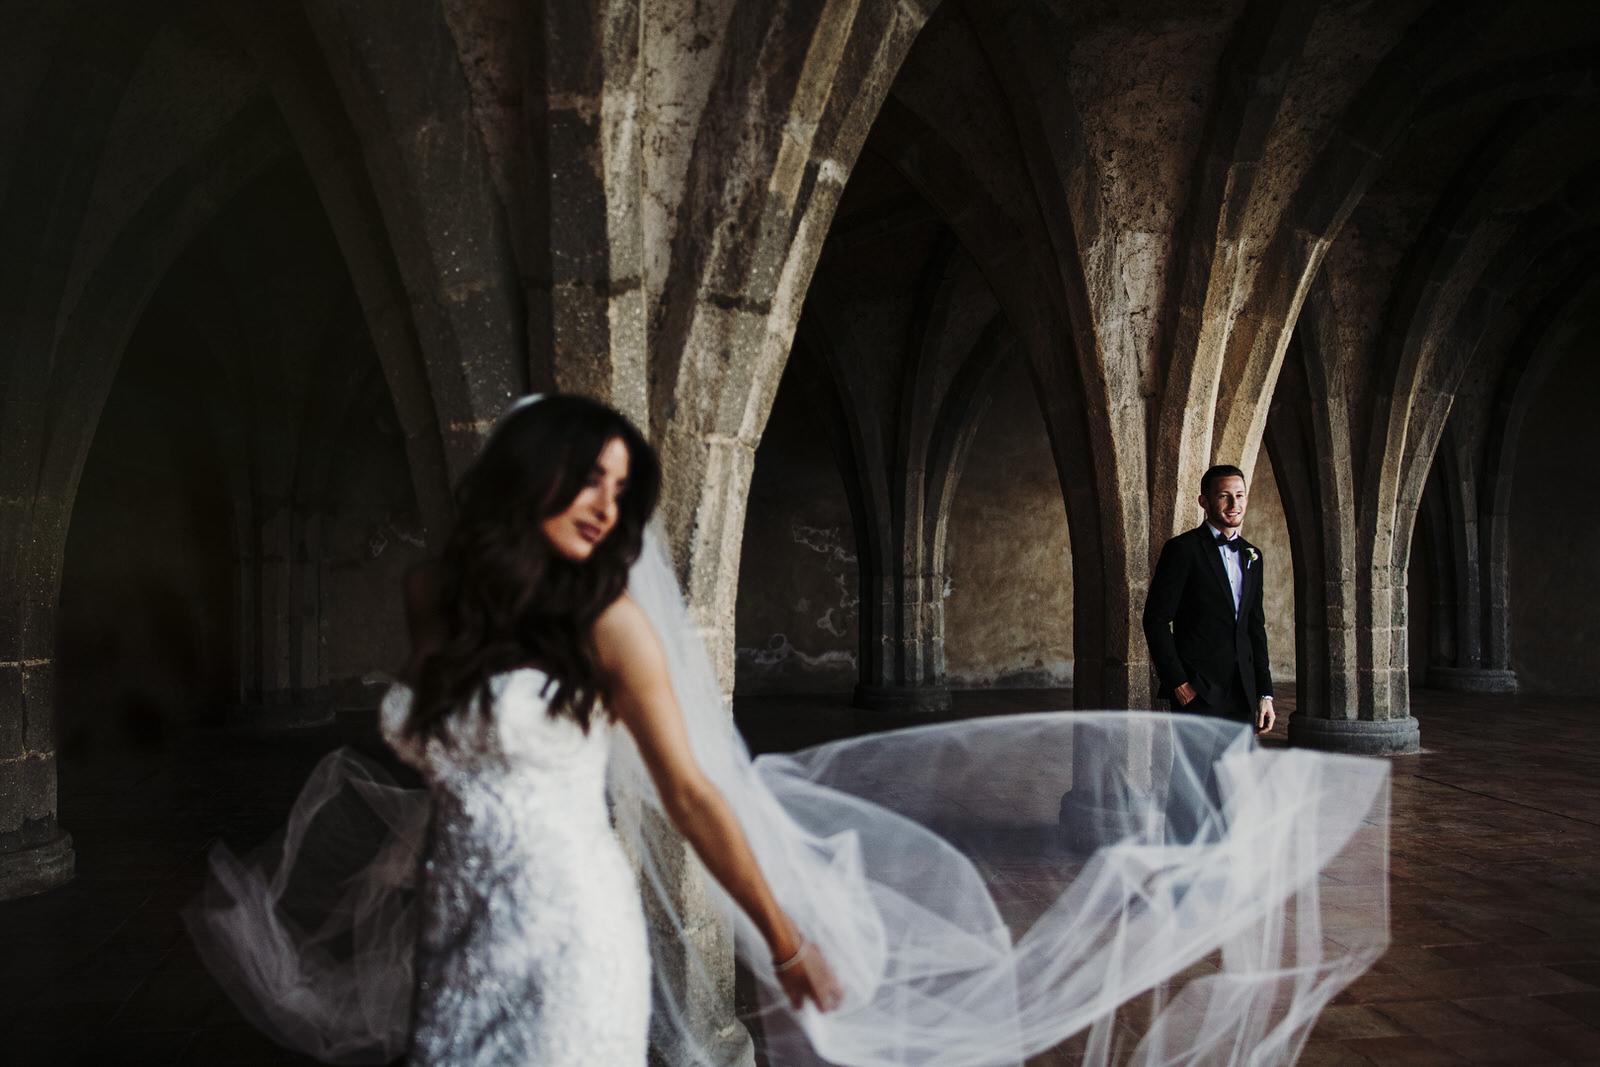 wedding photographer in italy-venice-tuscany-florence-amalfi coast-como lake-villa del balbianello-siena-amalfi-ravello-belmond-villa cimbrone59